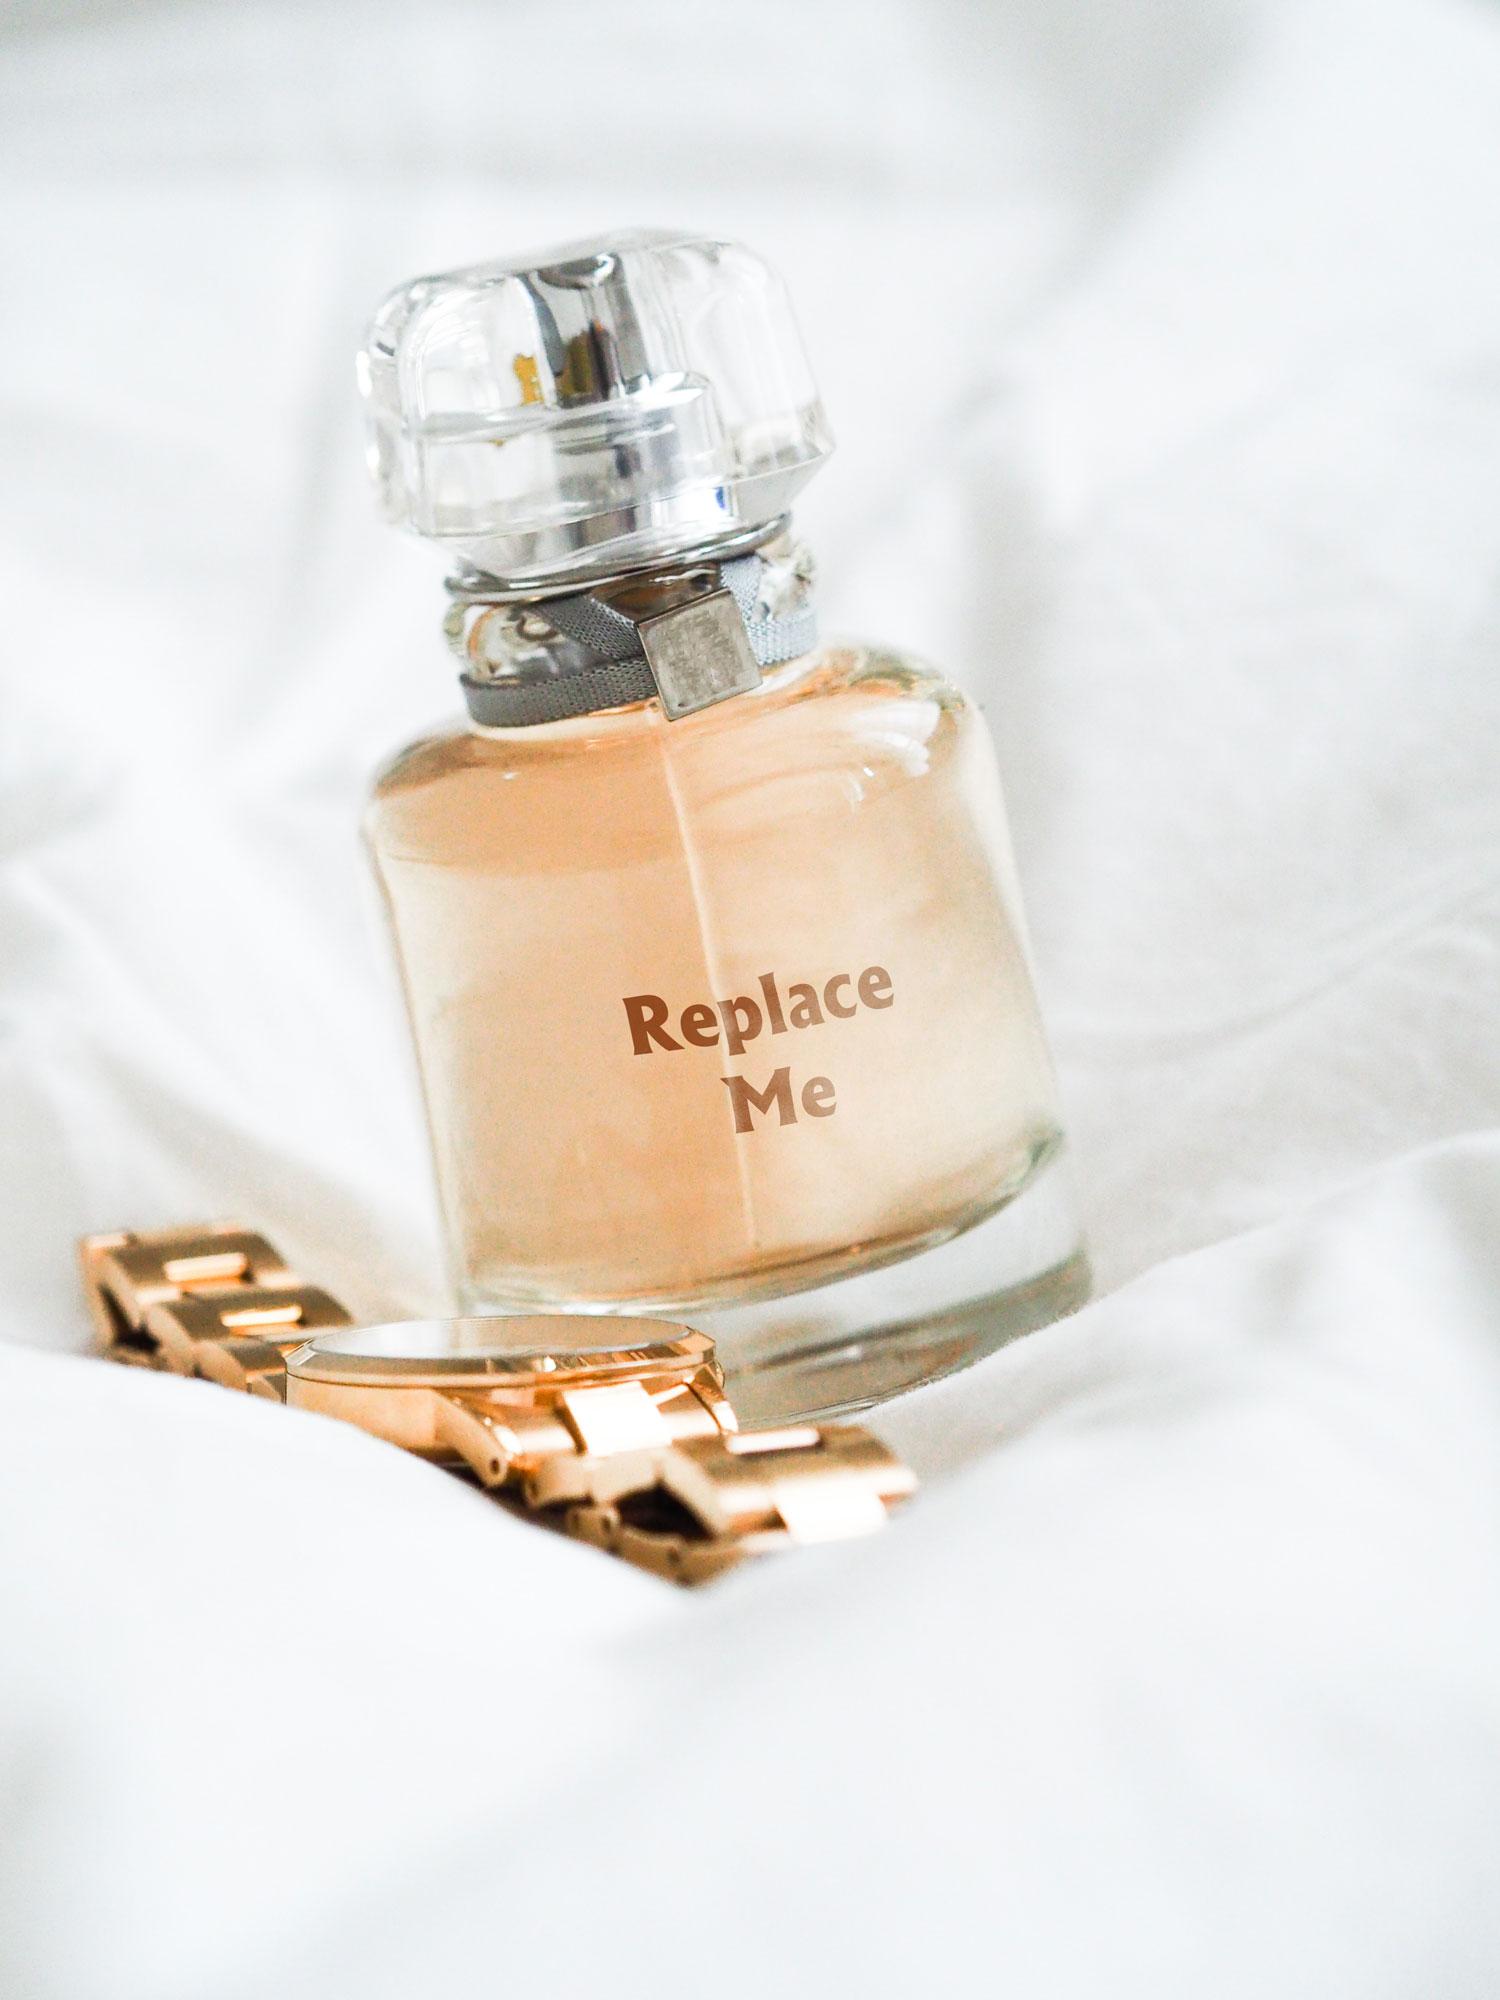 Perfume Flacon Bottle Mockup